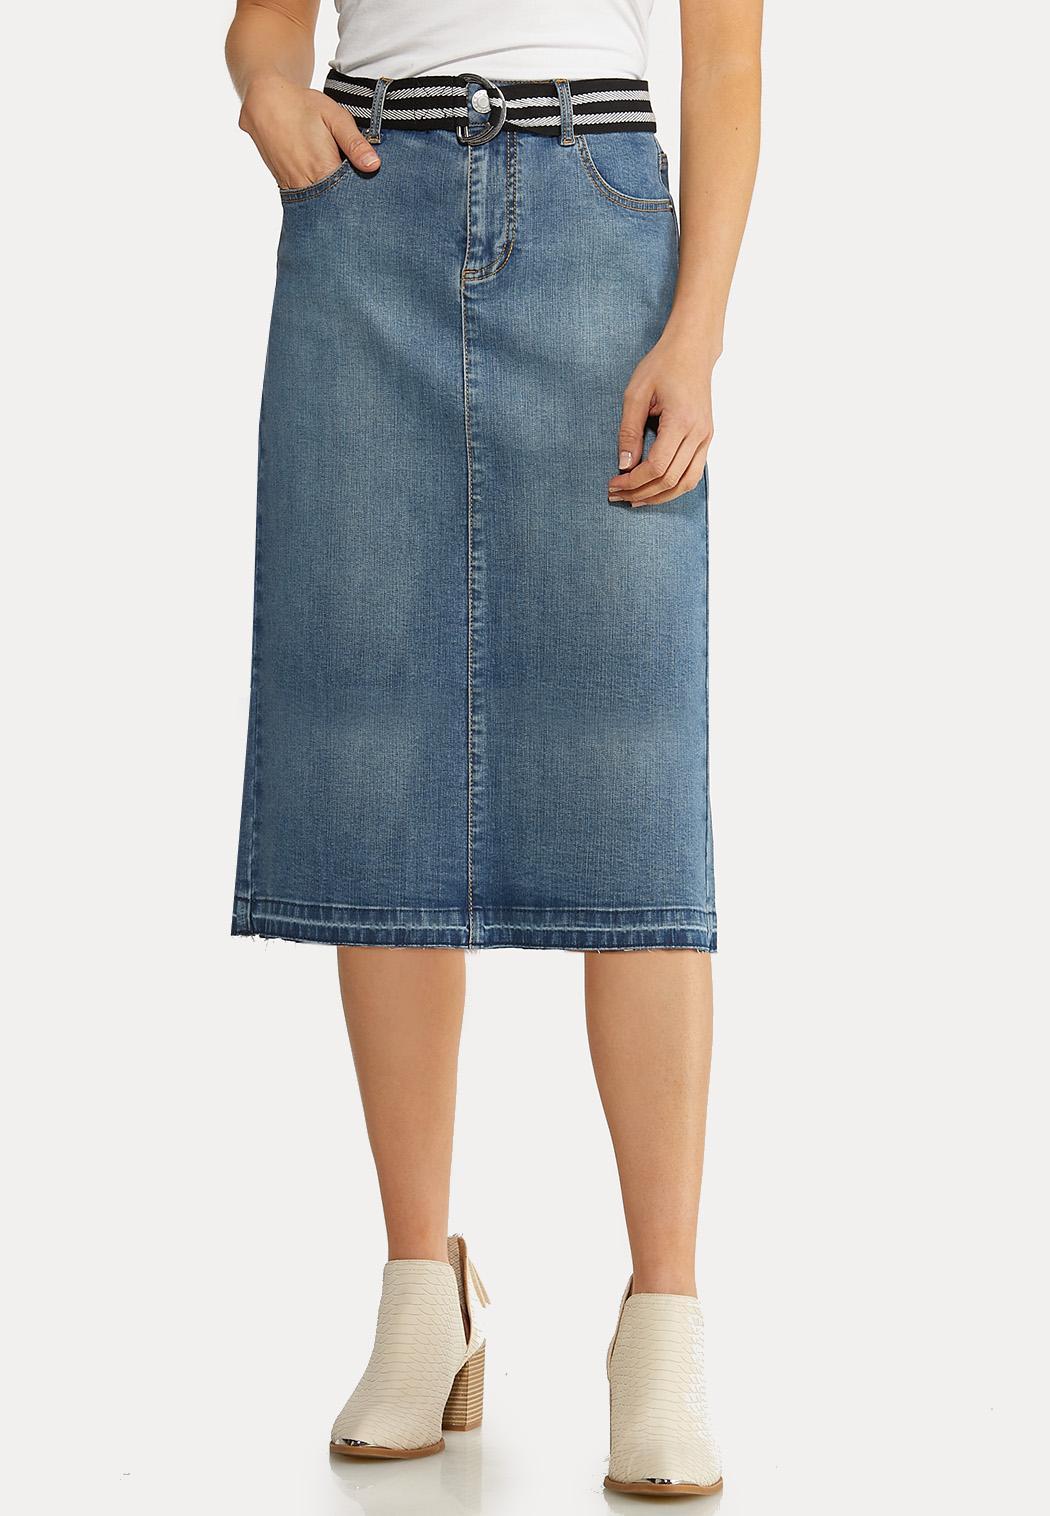 Plus Size Belted Denim Skirt